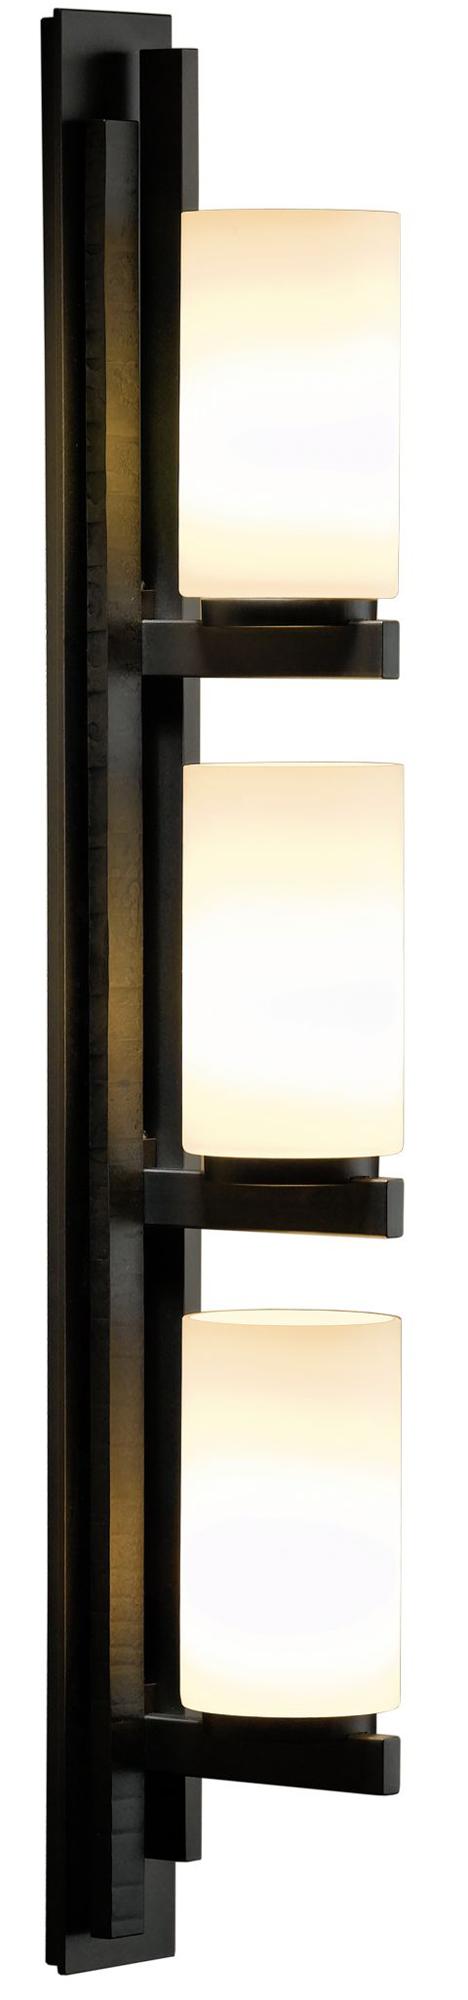 Ondrian Vertical Bathroom Vanity Light by Hubbardton Forge